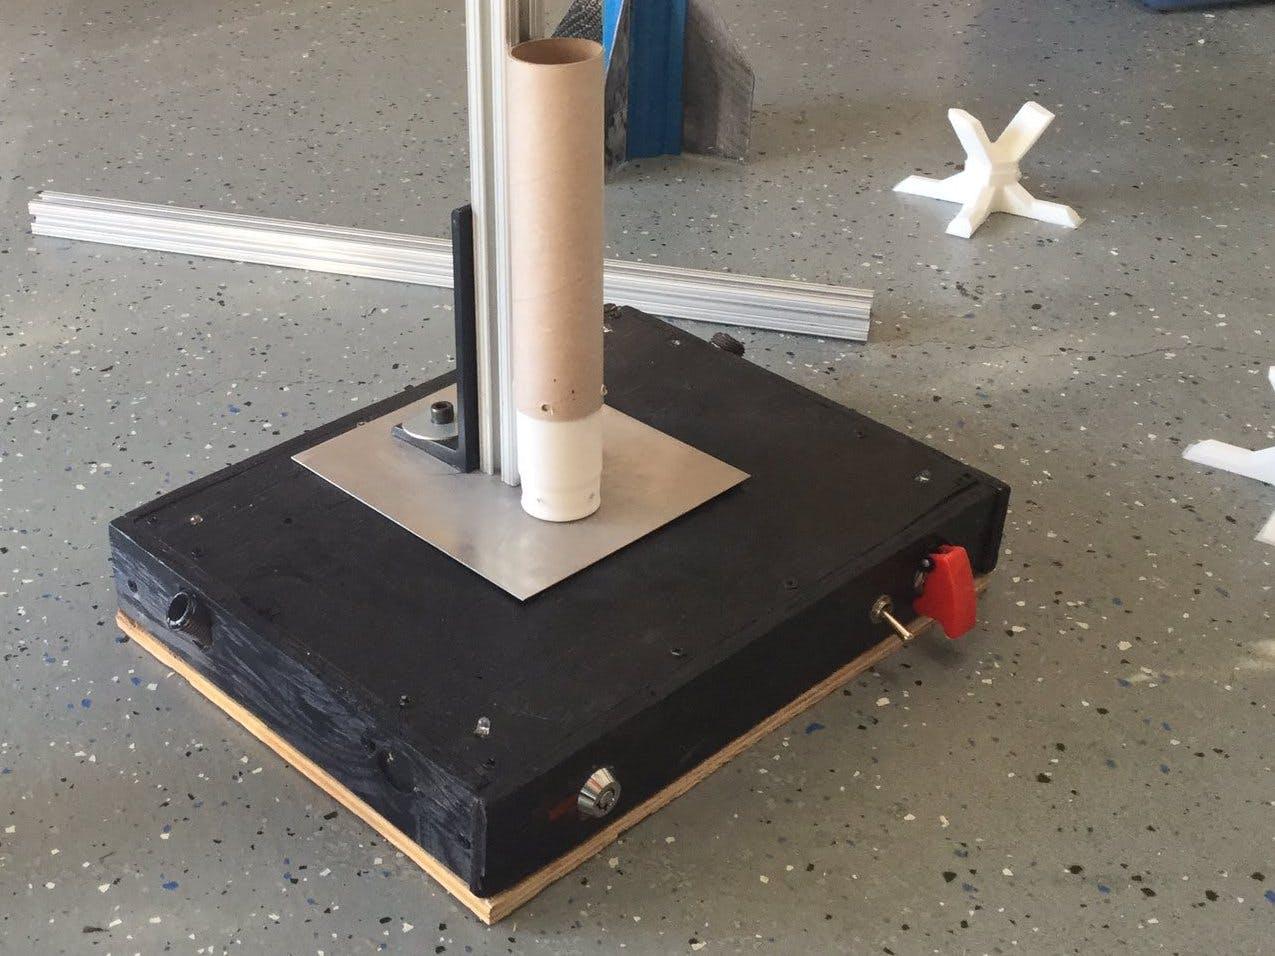 Advanced Rocket Launch Pad